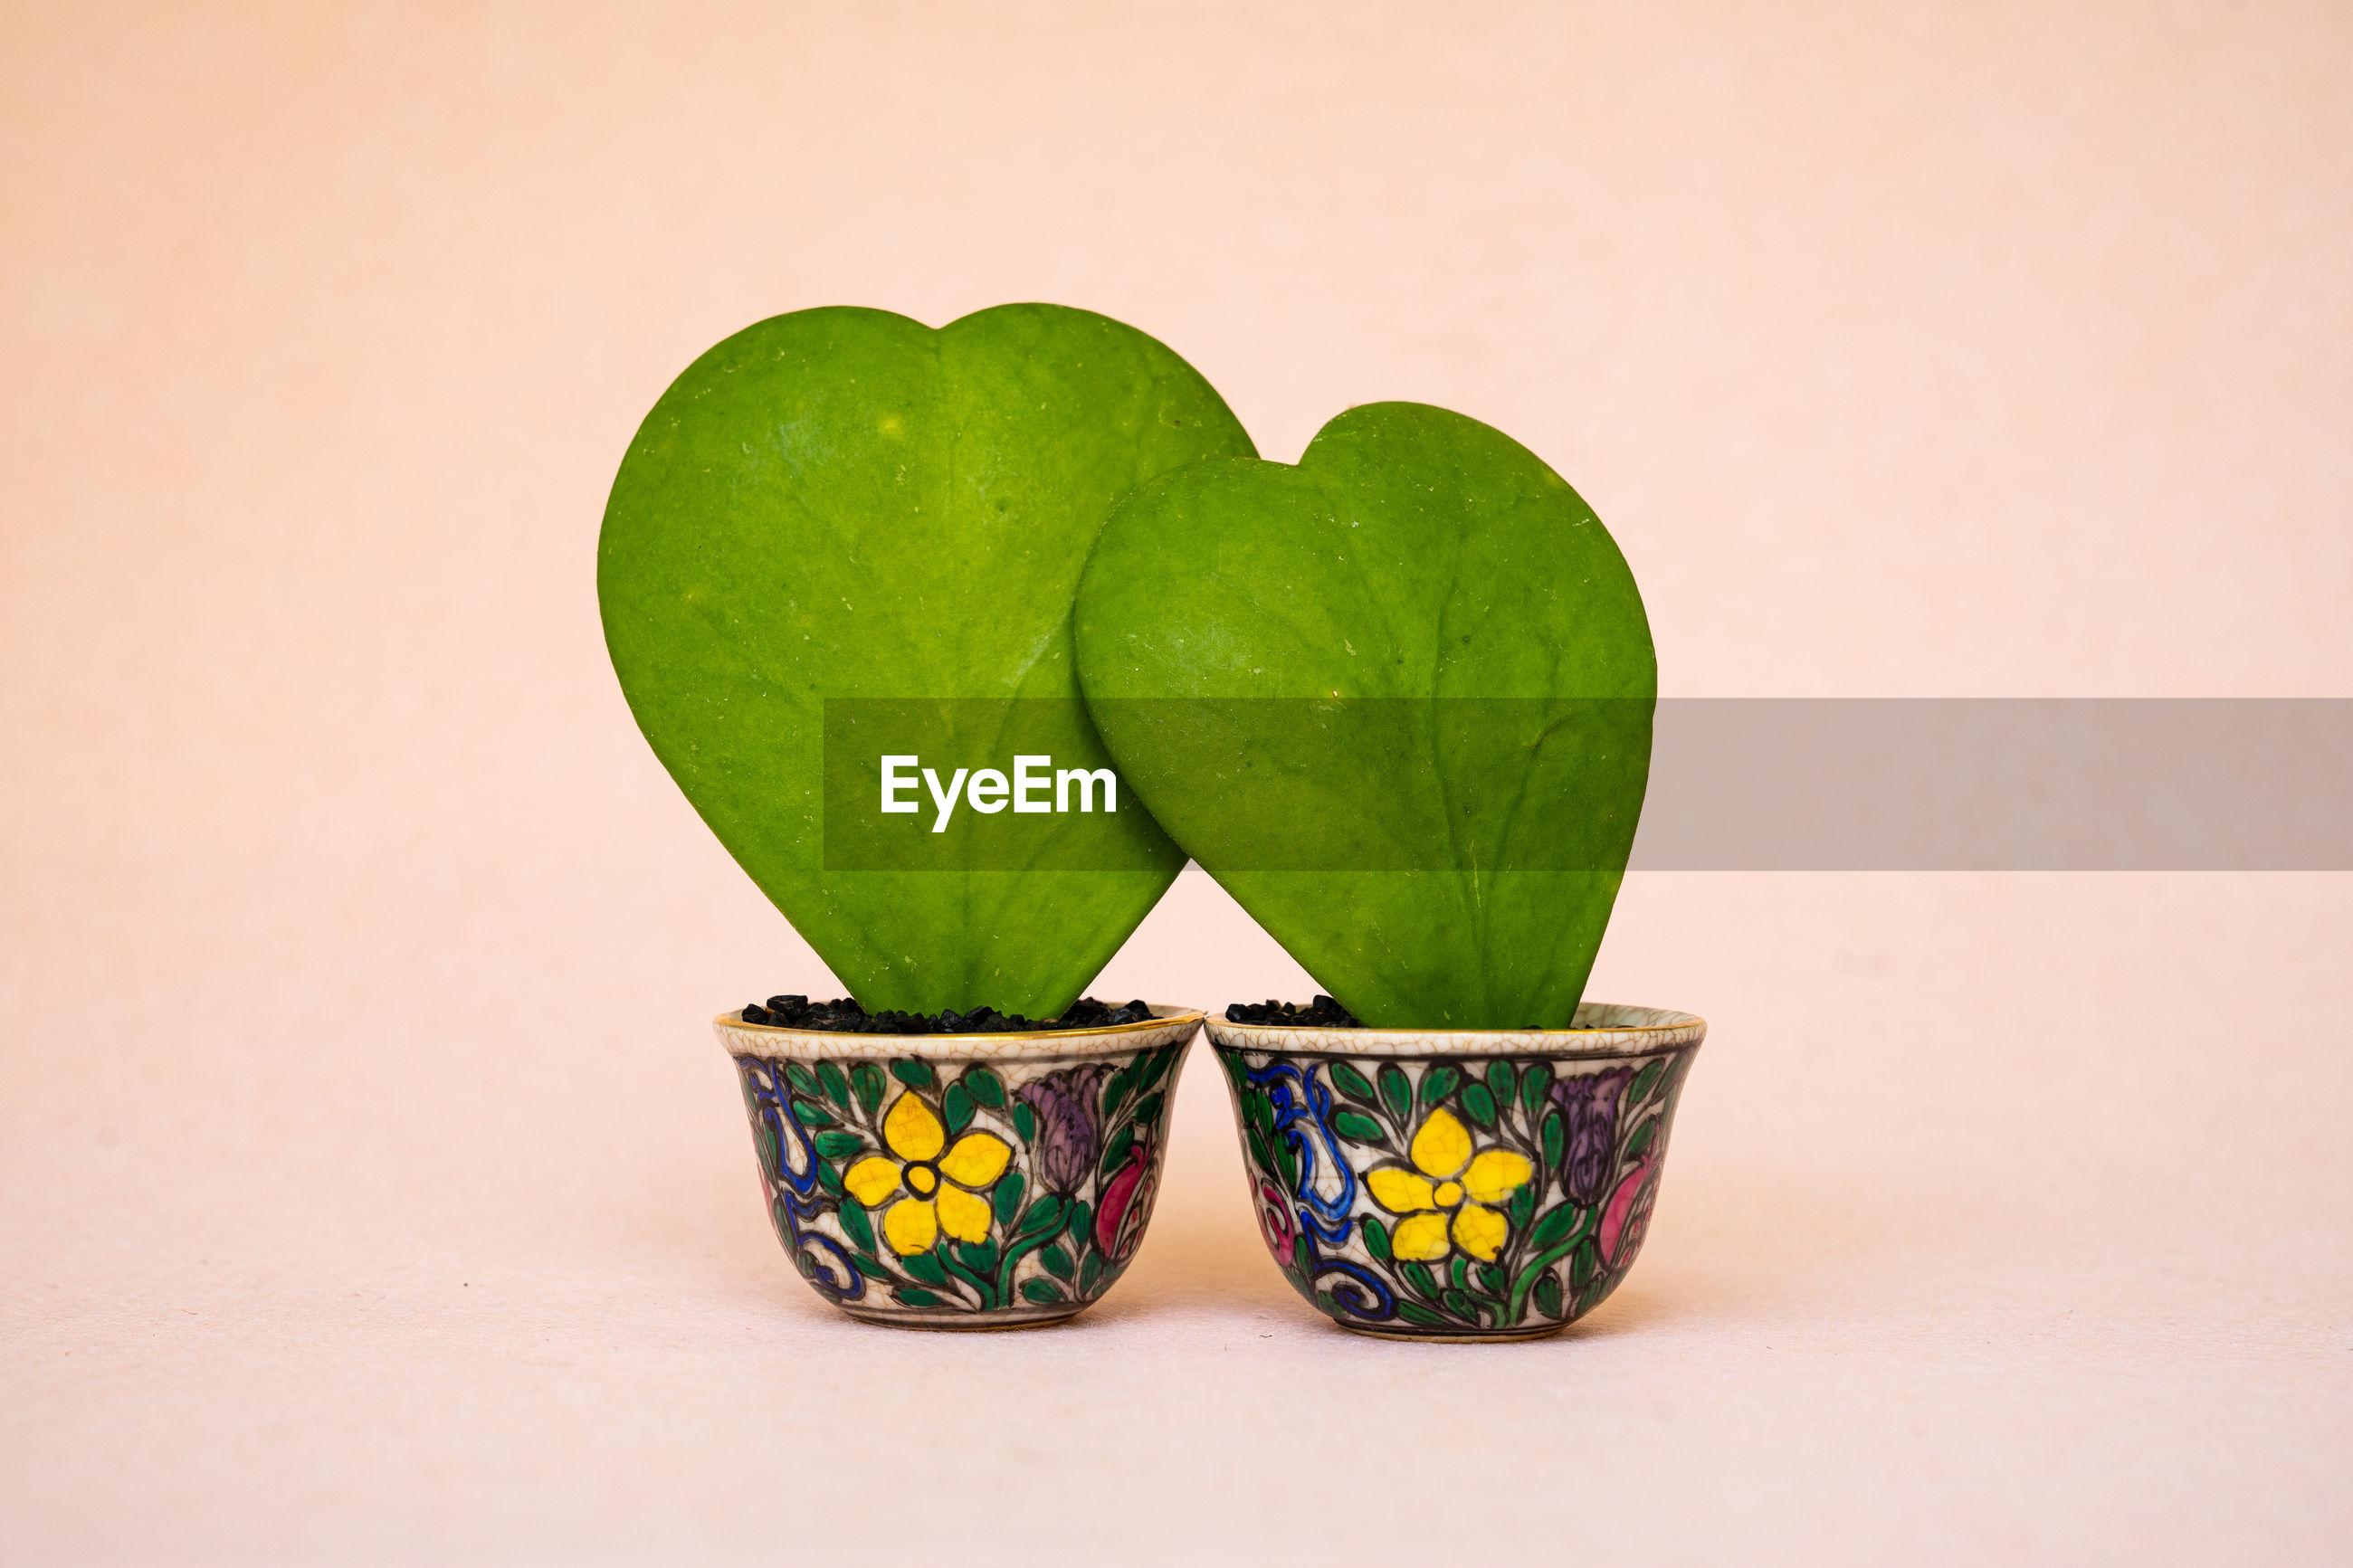 Two hoya kerri leaves on the beautiful small cups